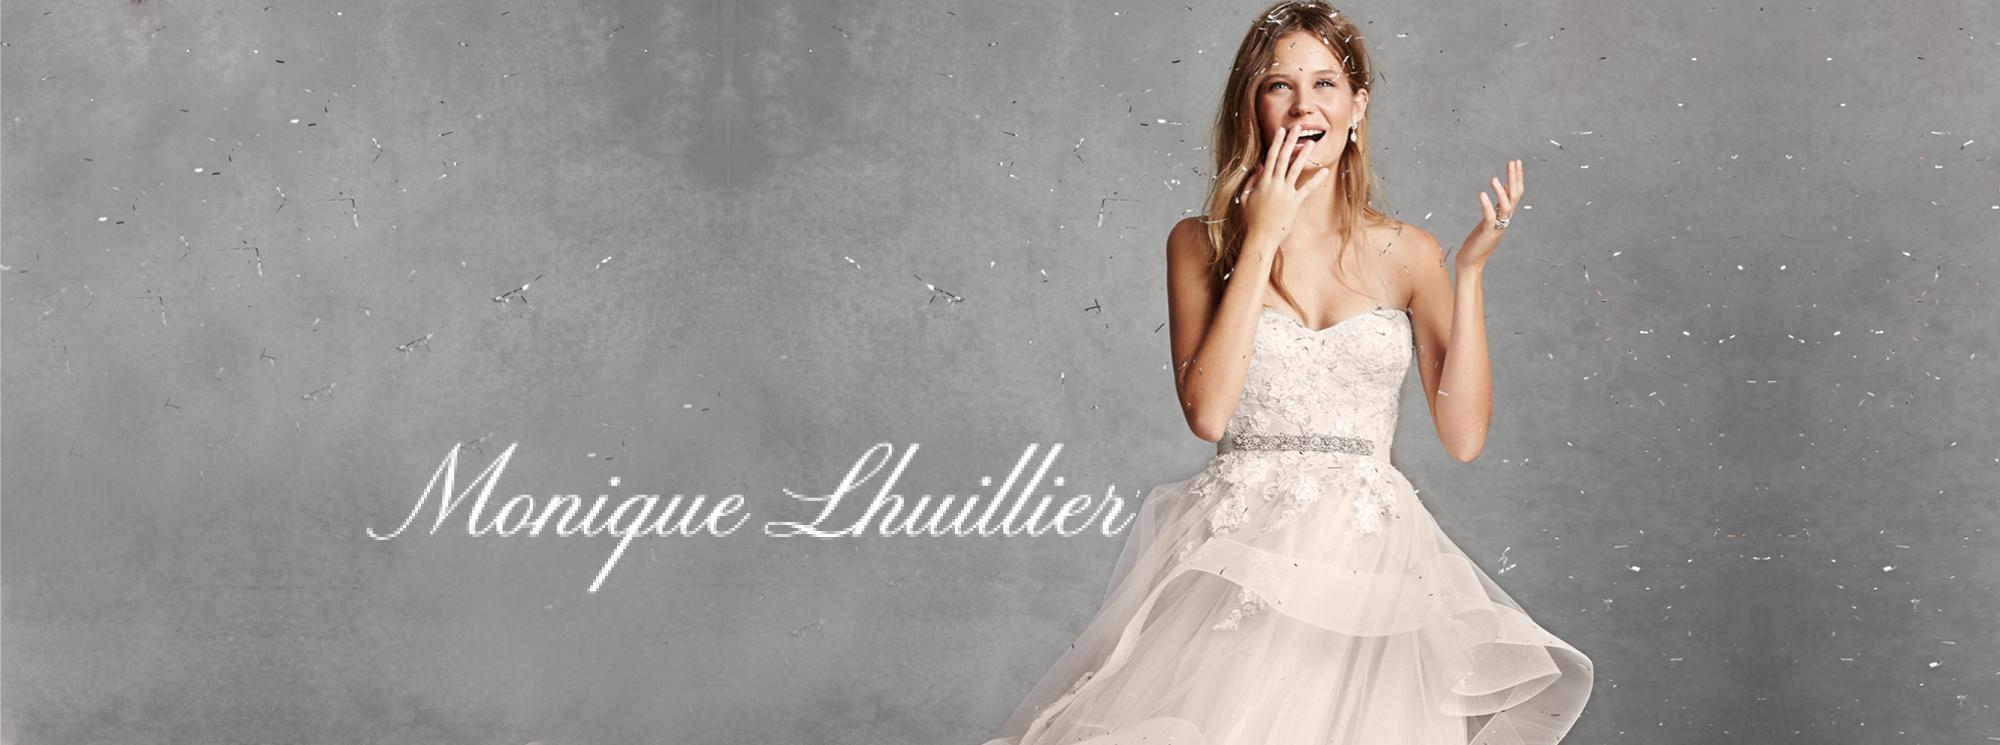 SoL and GRAVITE, Luxury Multilabel Bridal Boutique